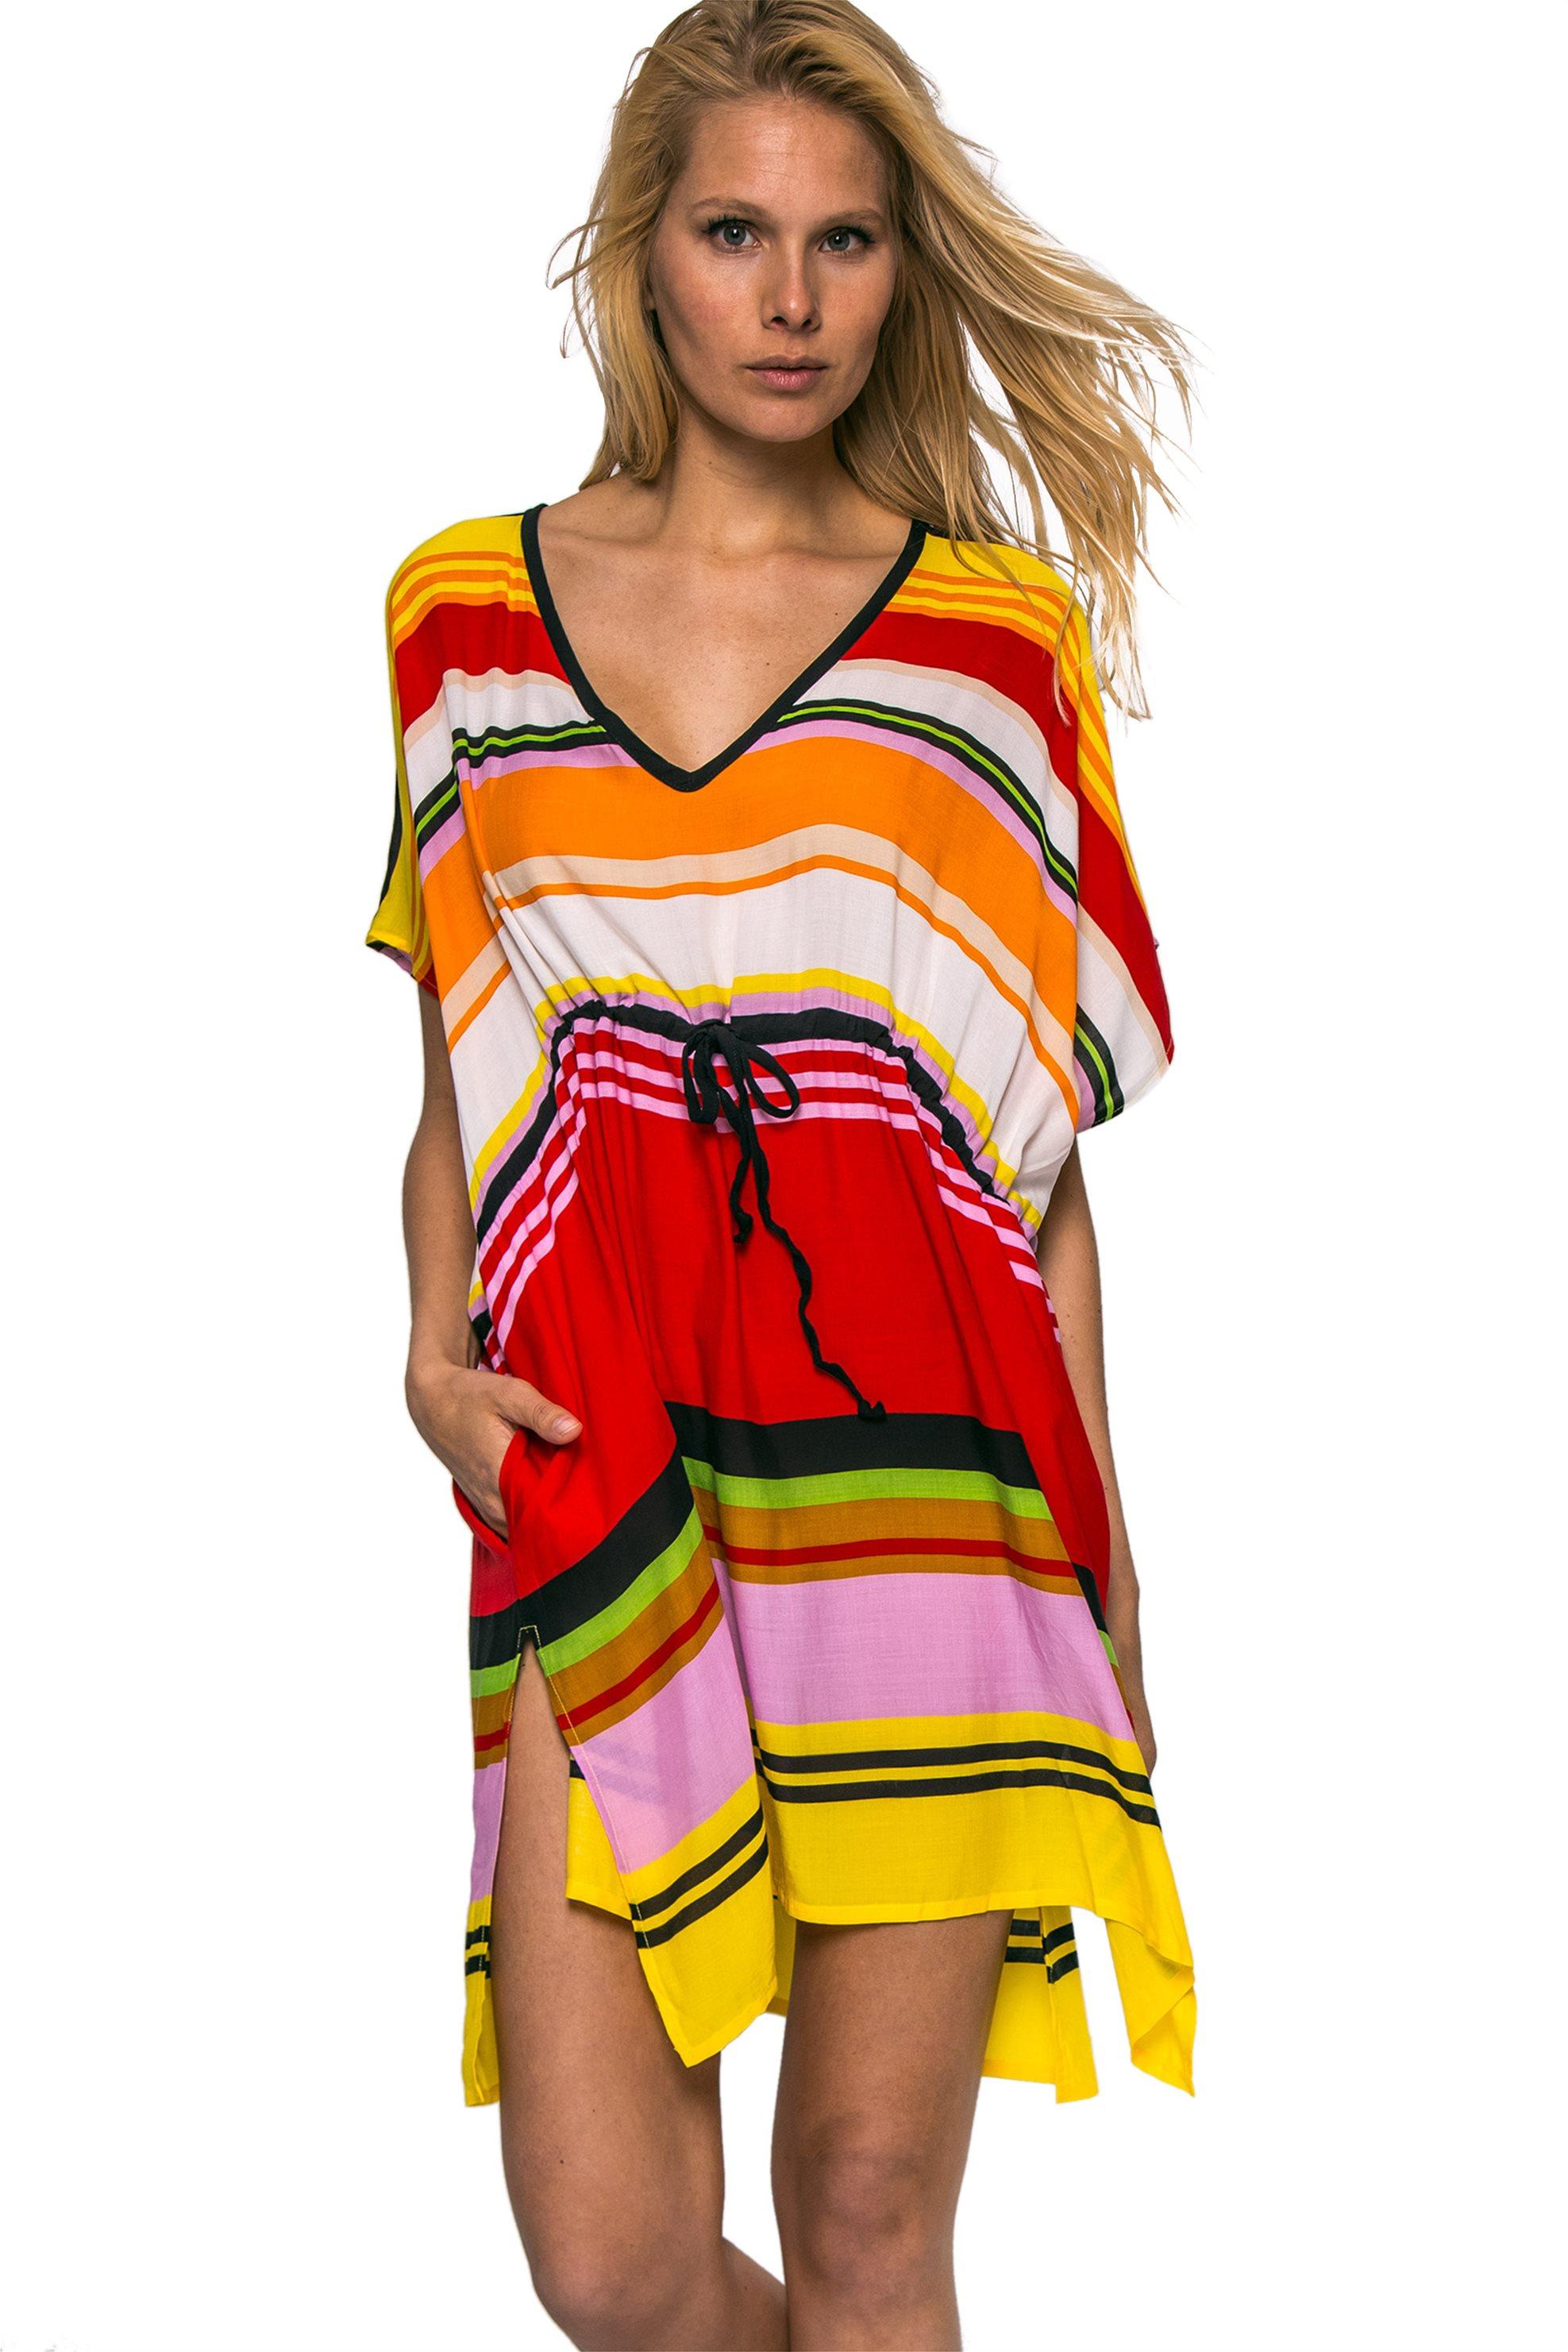 11d3f4b3f5ae Γυναικεία   Ρούχα   Πουκάμισα   Denim πουκάμισο με βαμβάκι και ...